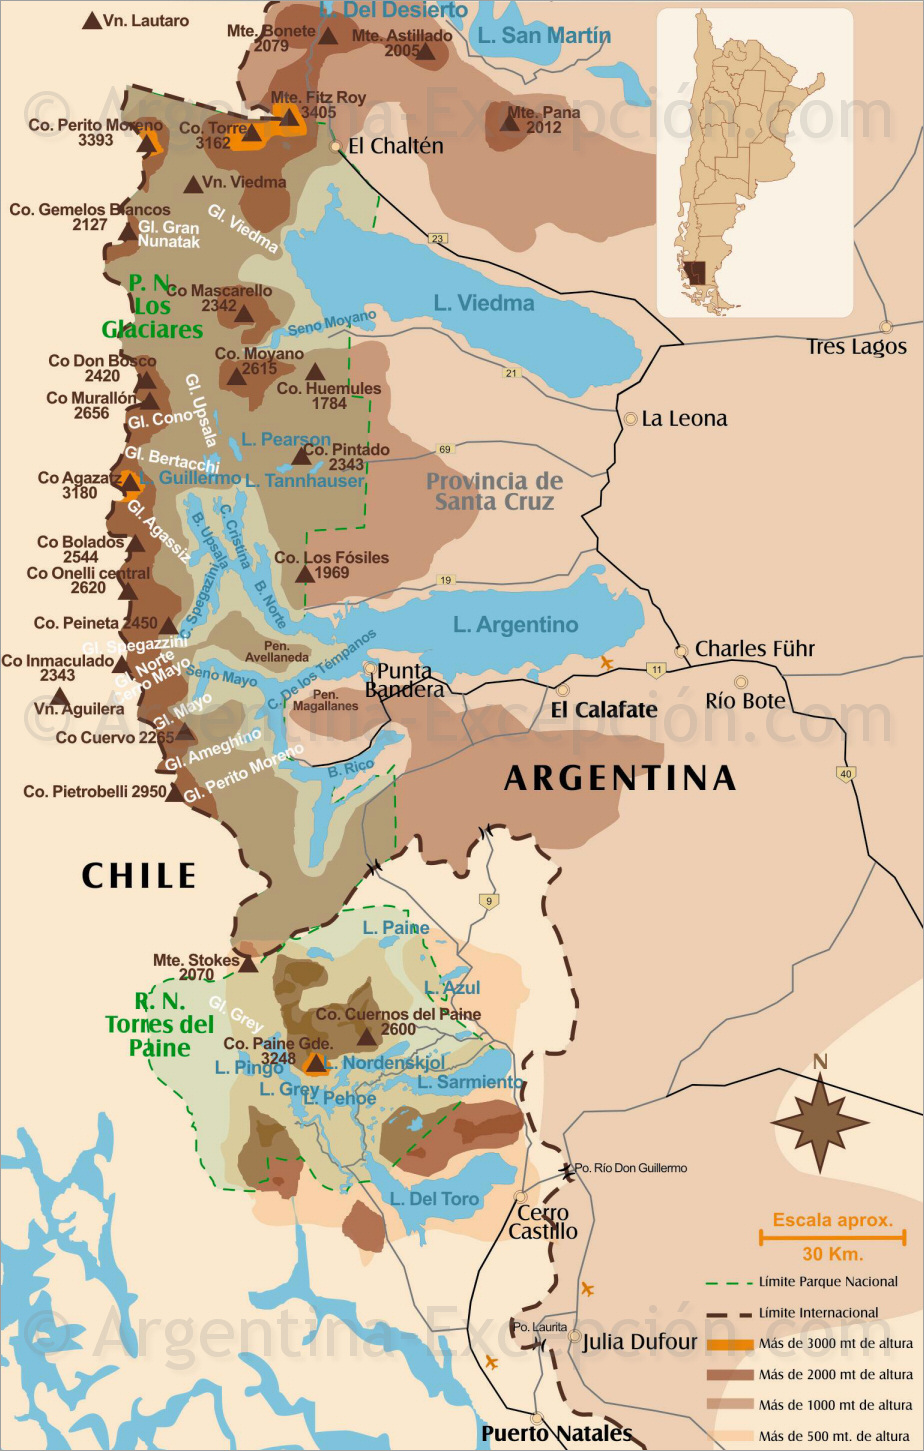 carte des glaciers de patagonie perito moreno viedma upsala spegazzini. Black Bedroom Furniture Sets. Home Design Ideas